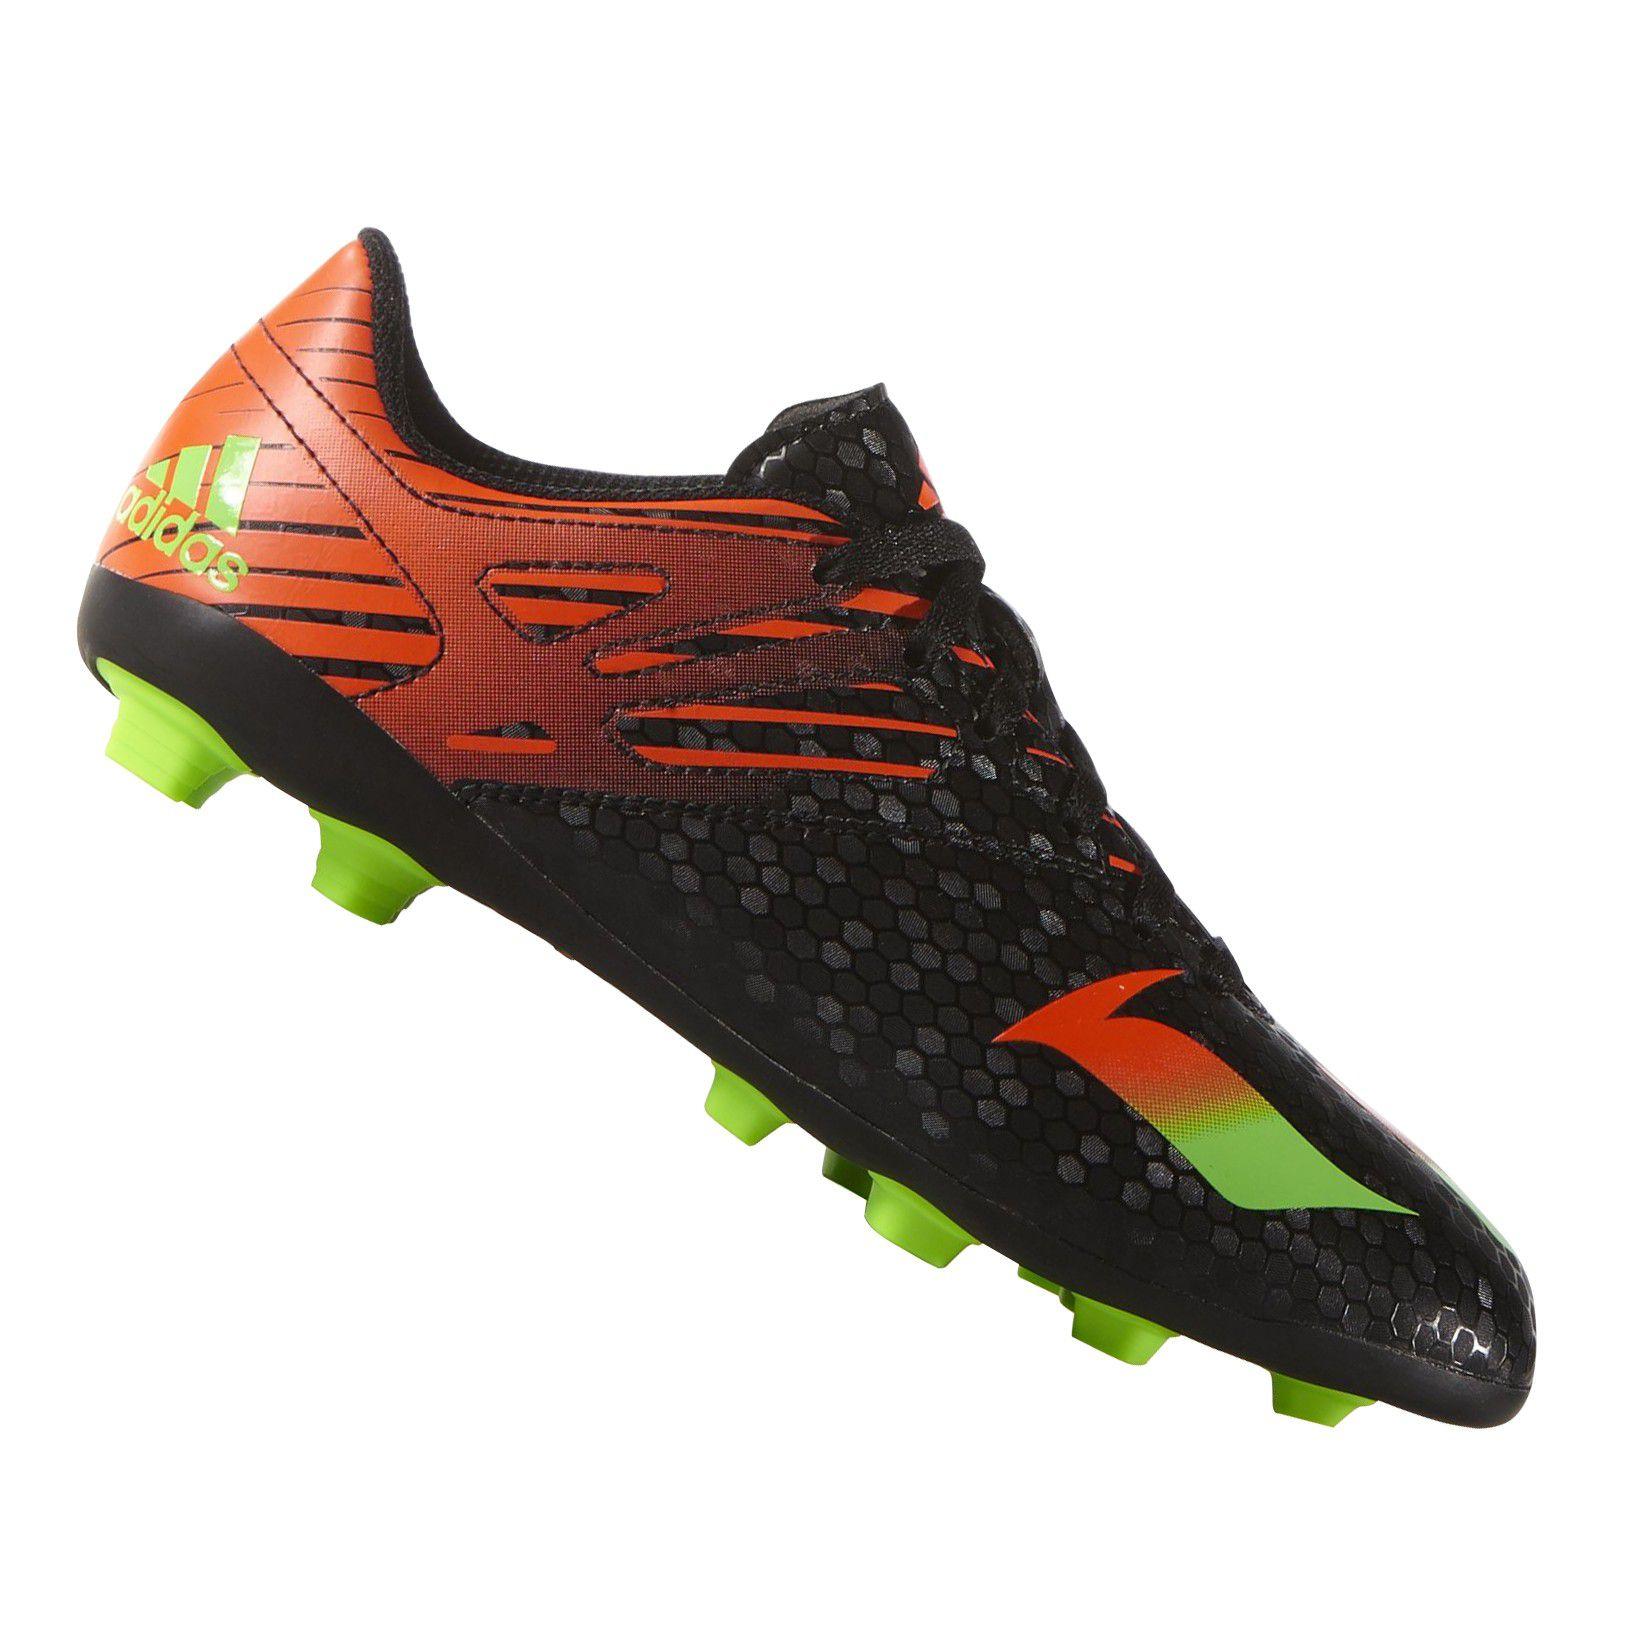 Chuteira Adidas Messi 15.4 FxG J